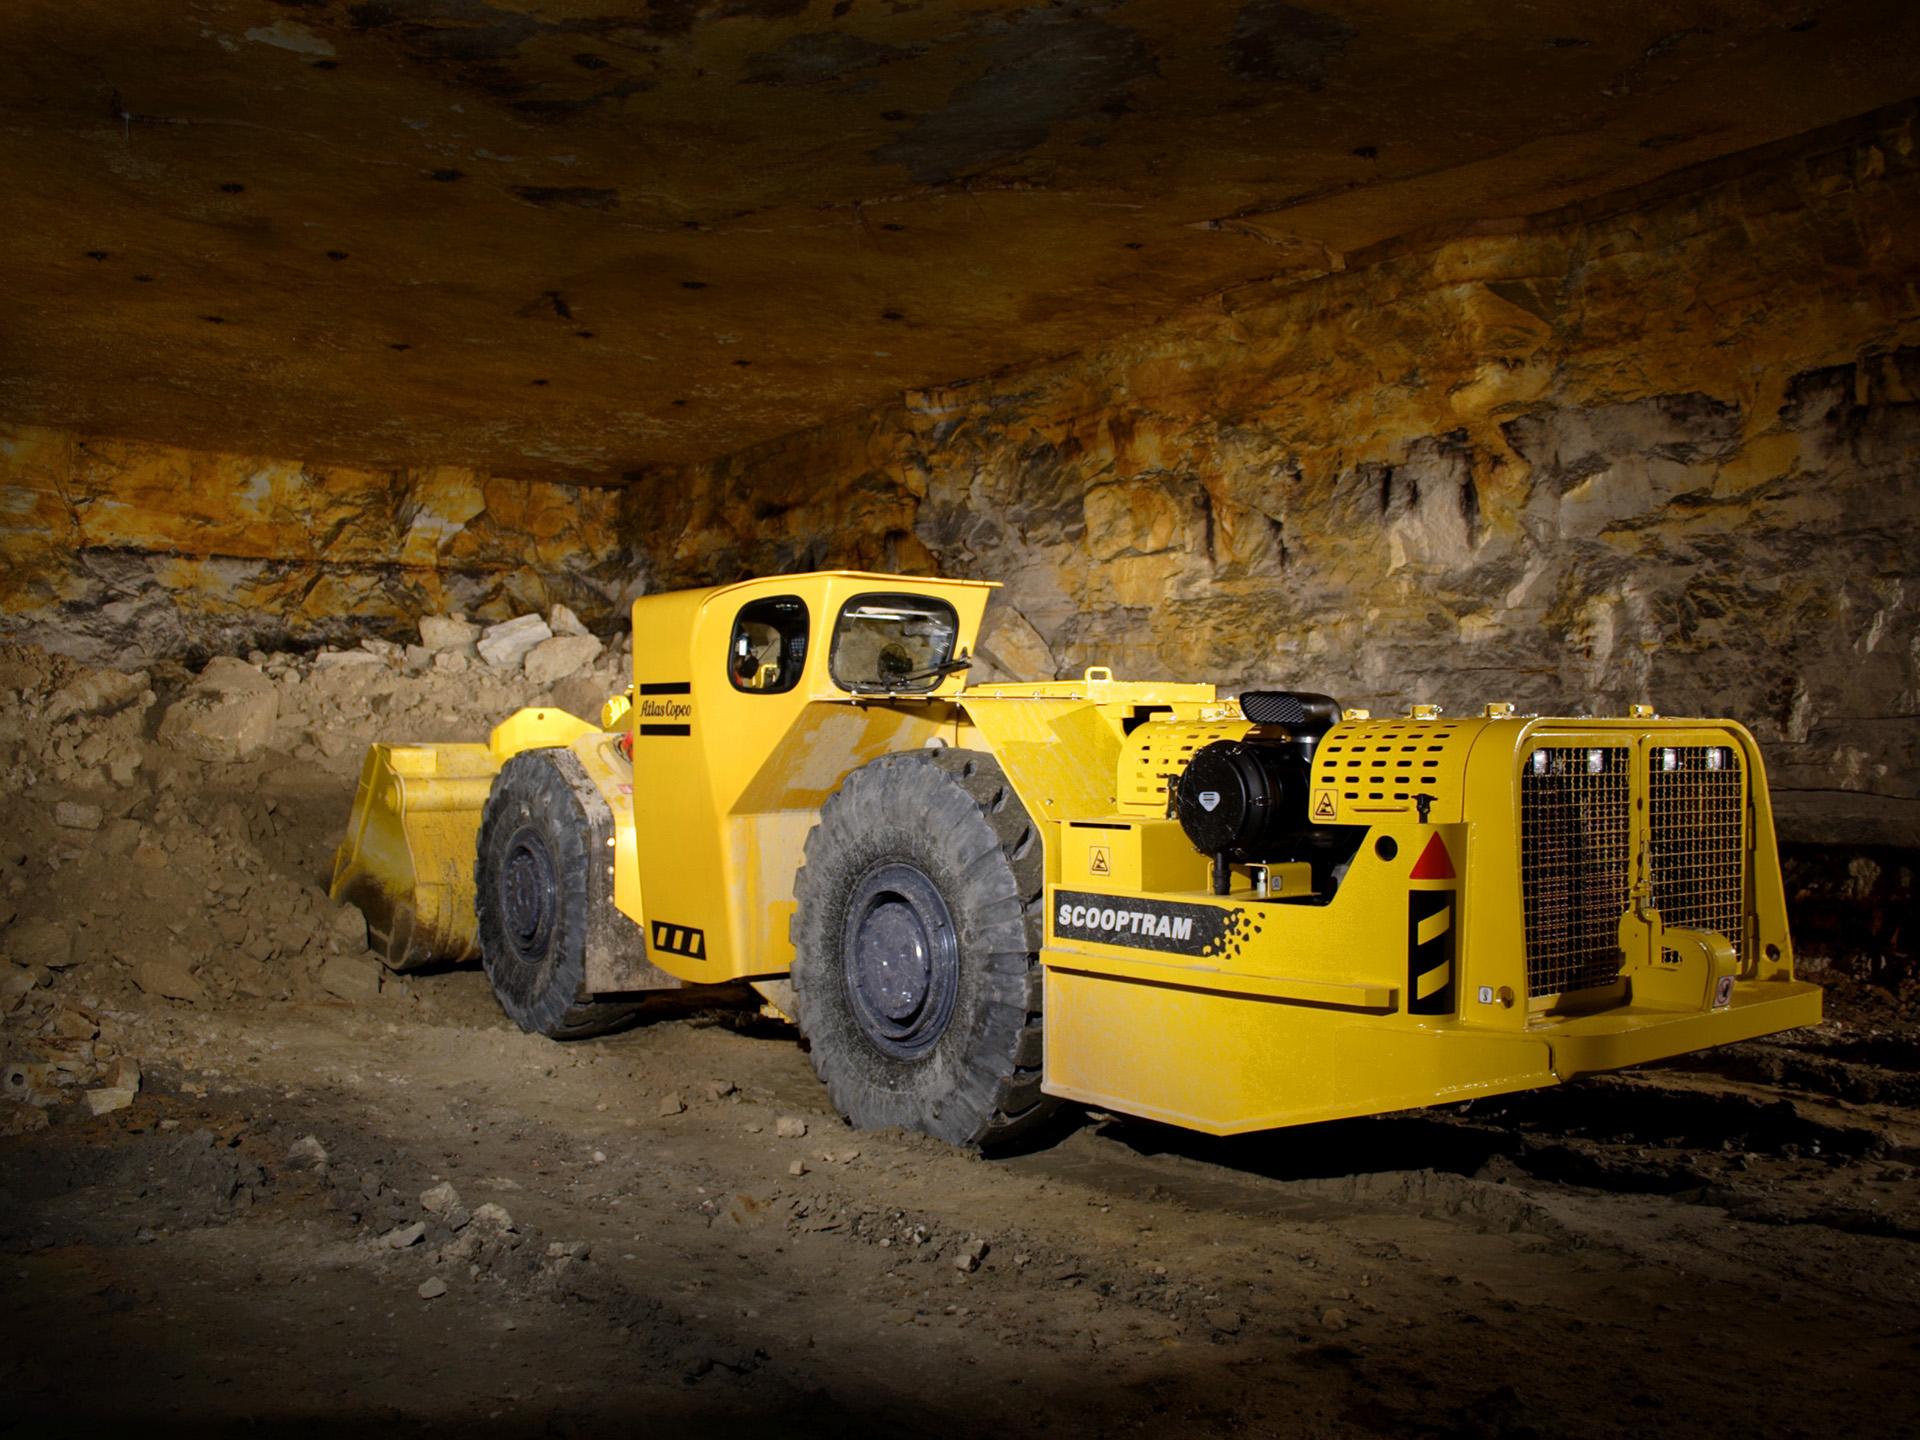 фото горно шахтного оборудования картинки при